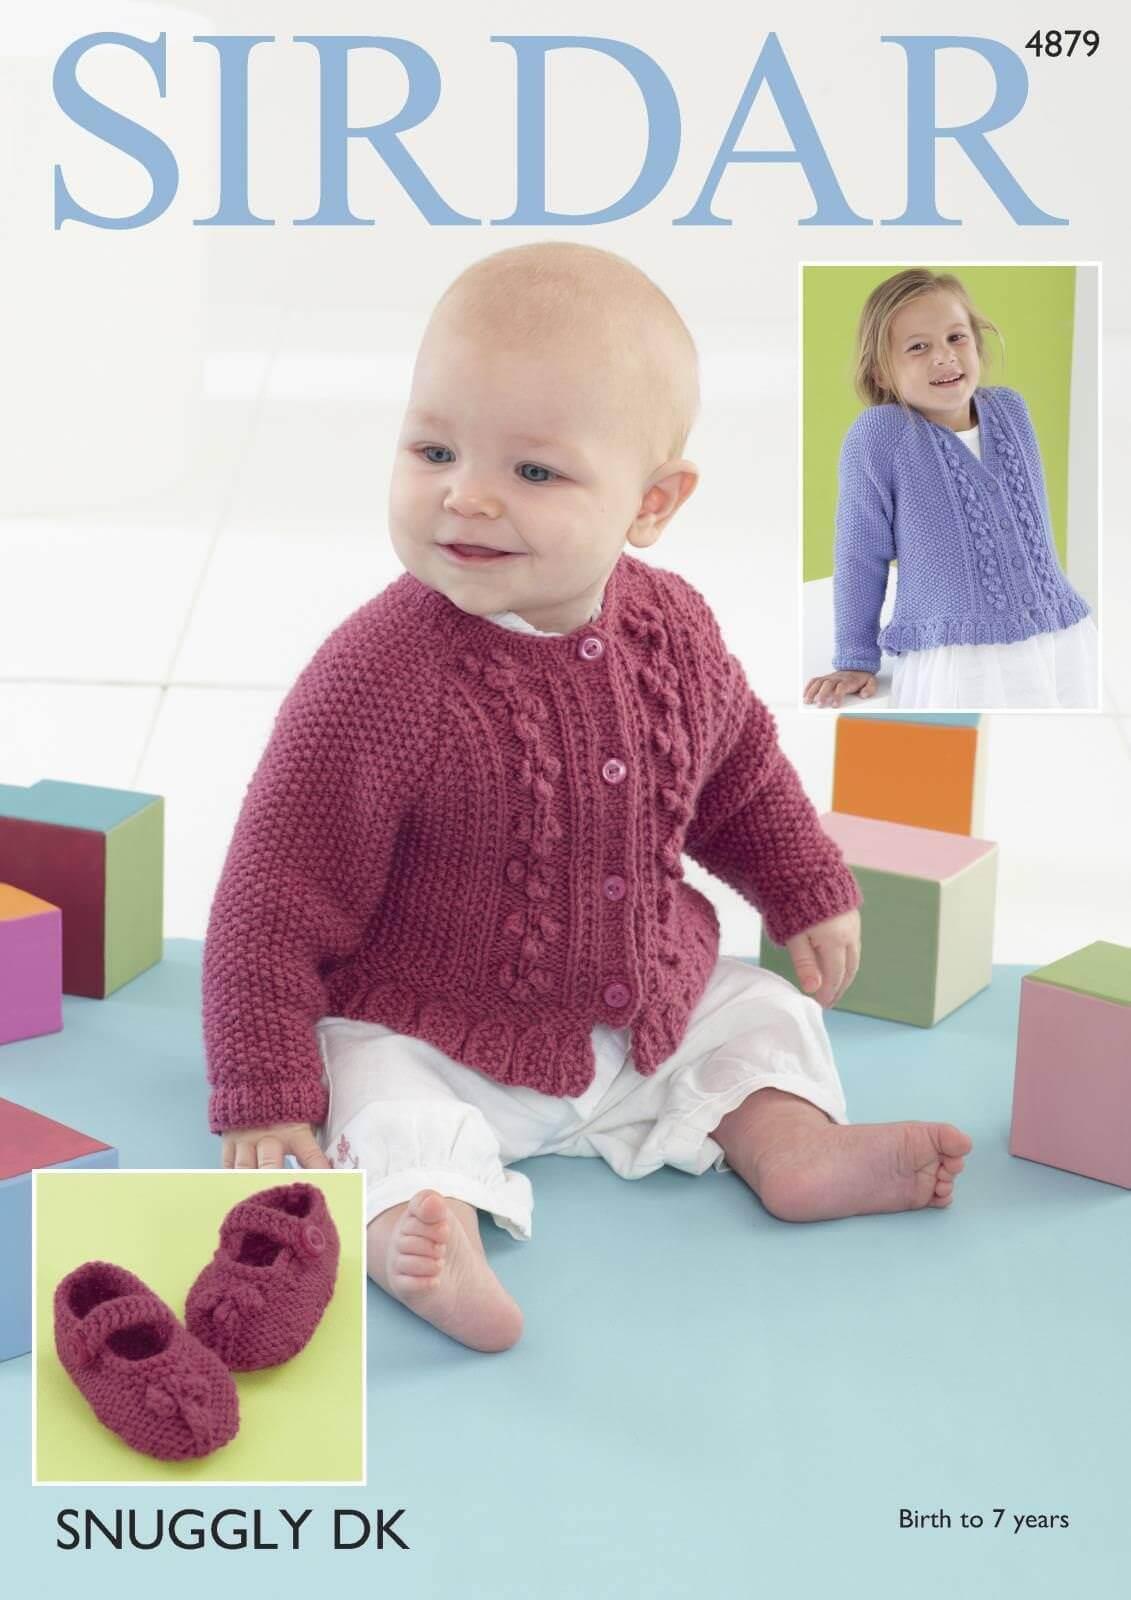 Sirdar Knitting Pattern 4879 Baby Childrens Round Neck Cardigan 0-7 Years